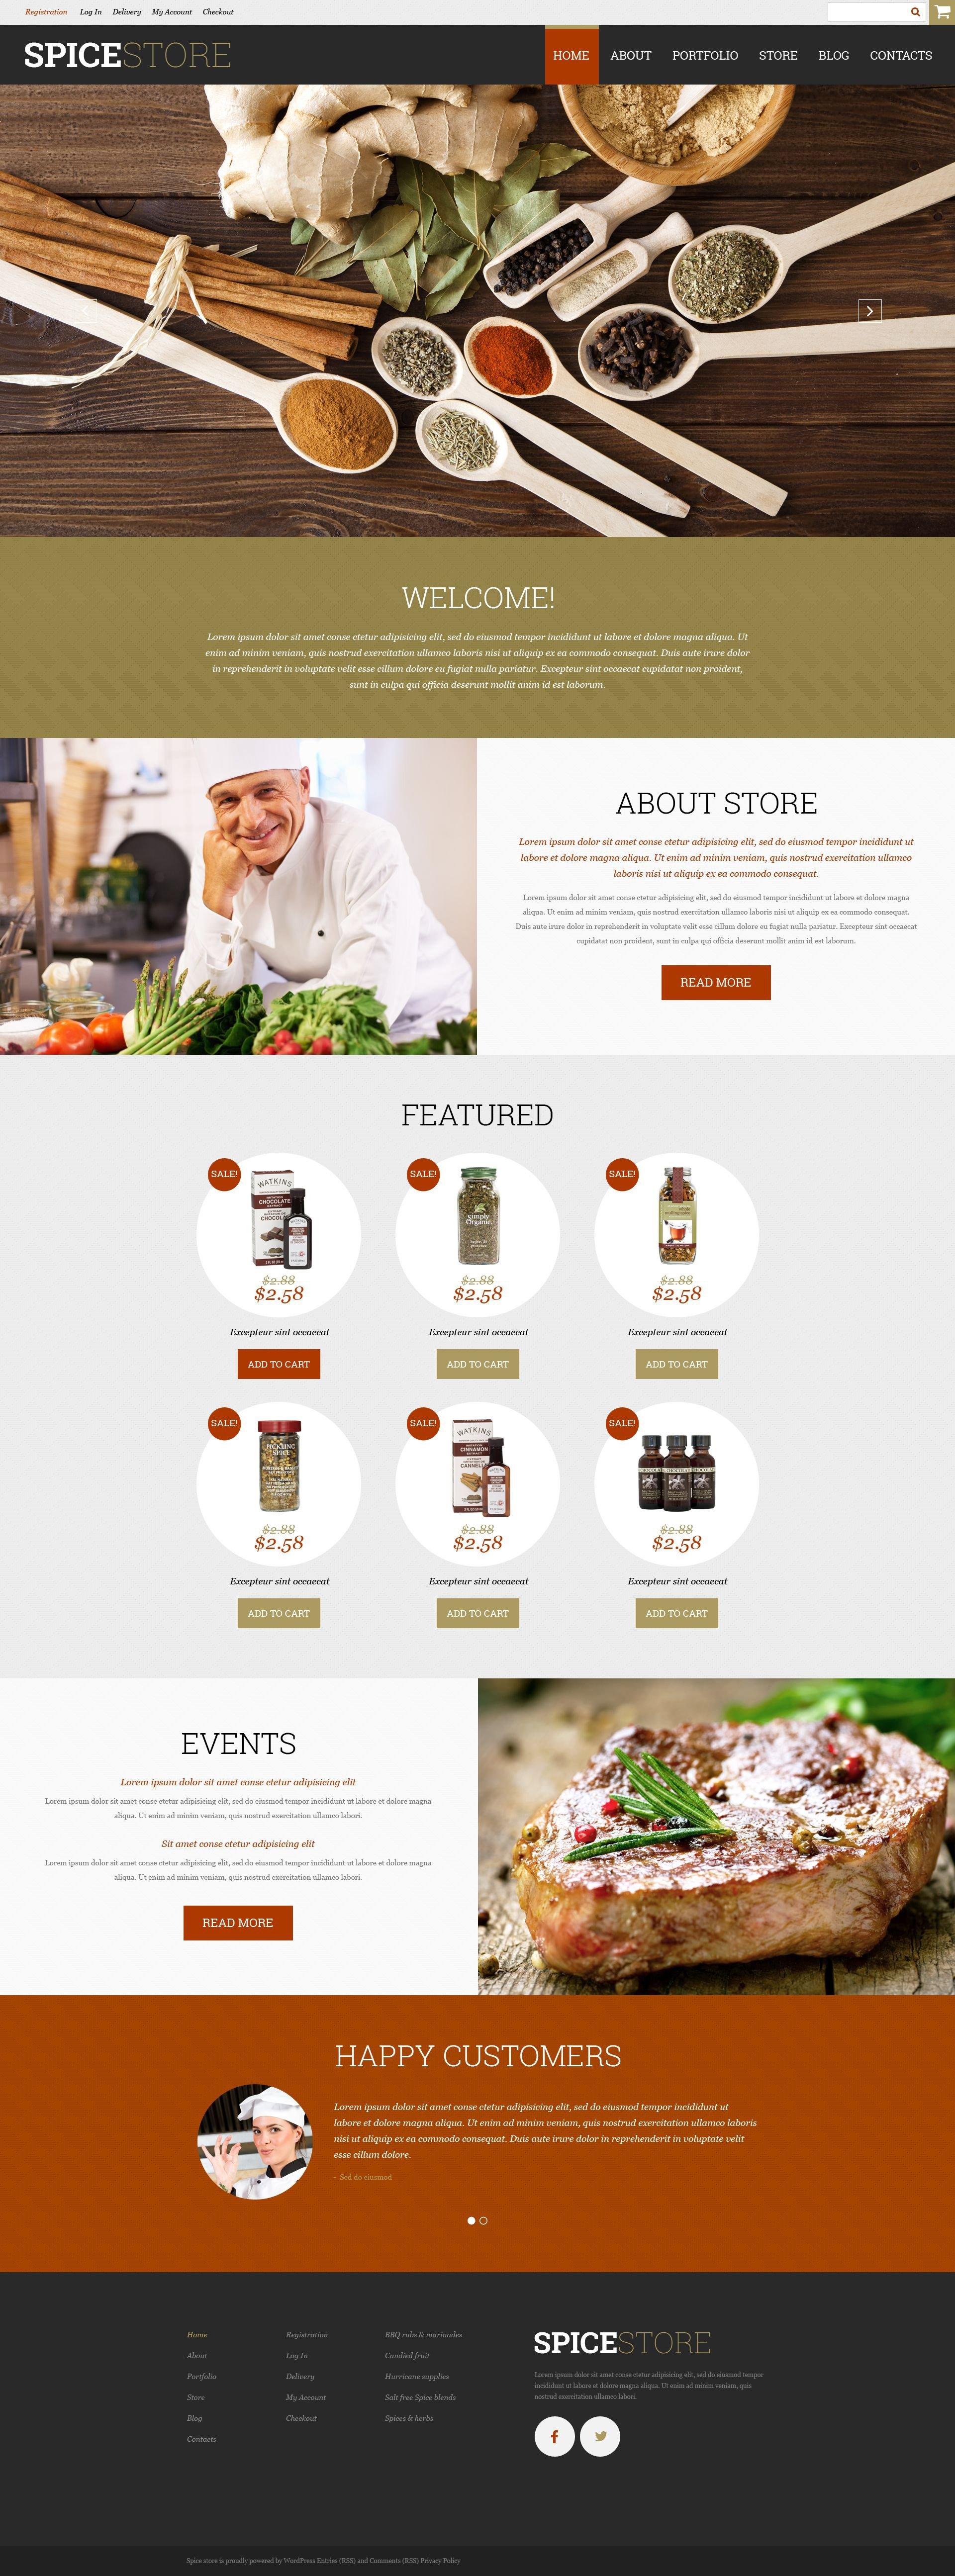 Responsivt Spice Shop WooCommerce-tema #52329 - skärmbild